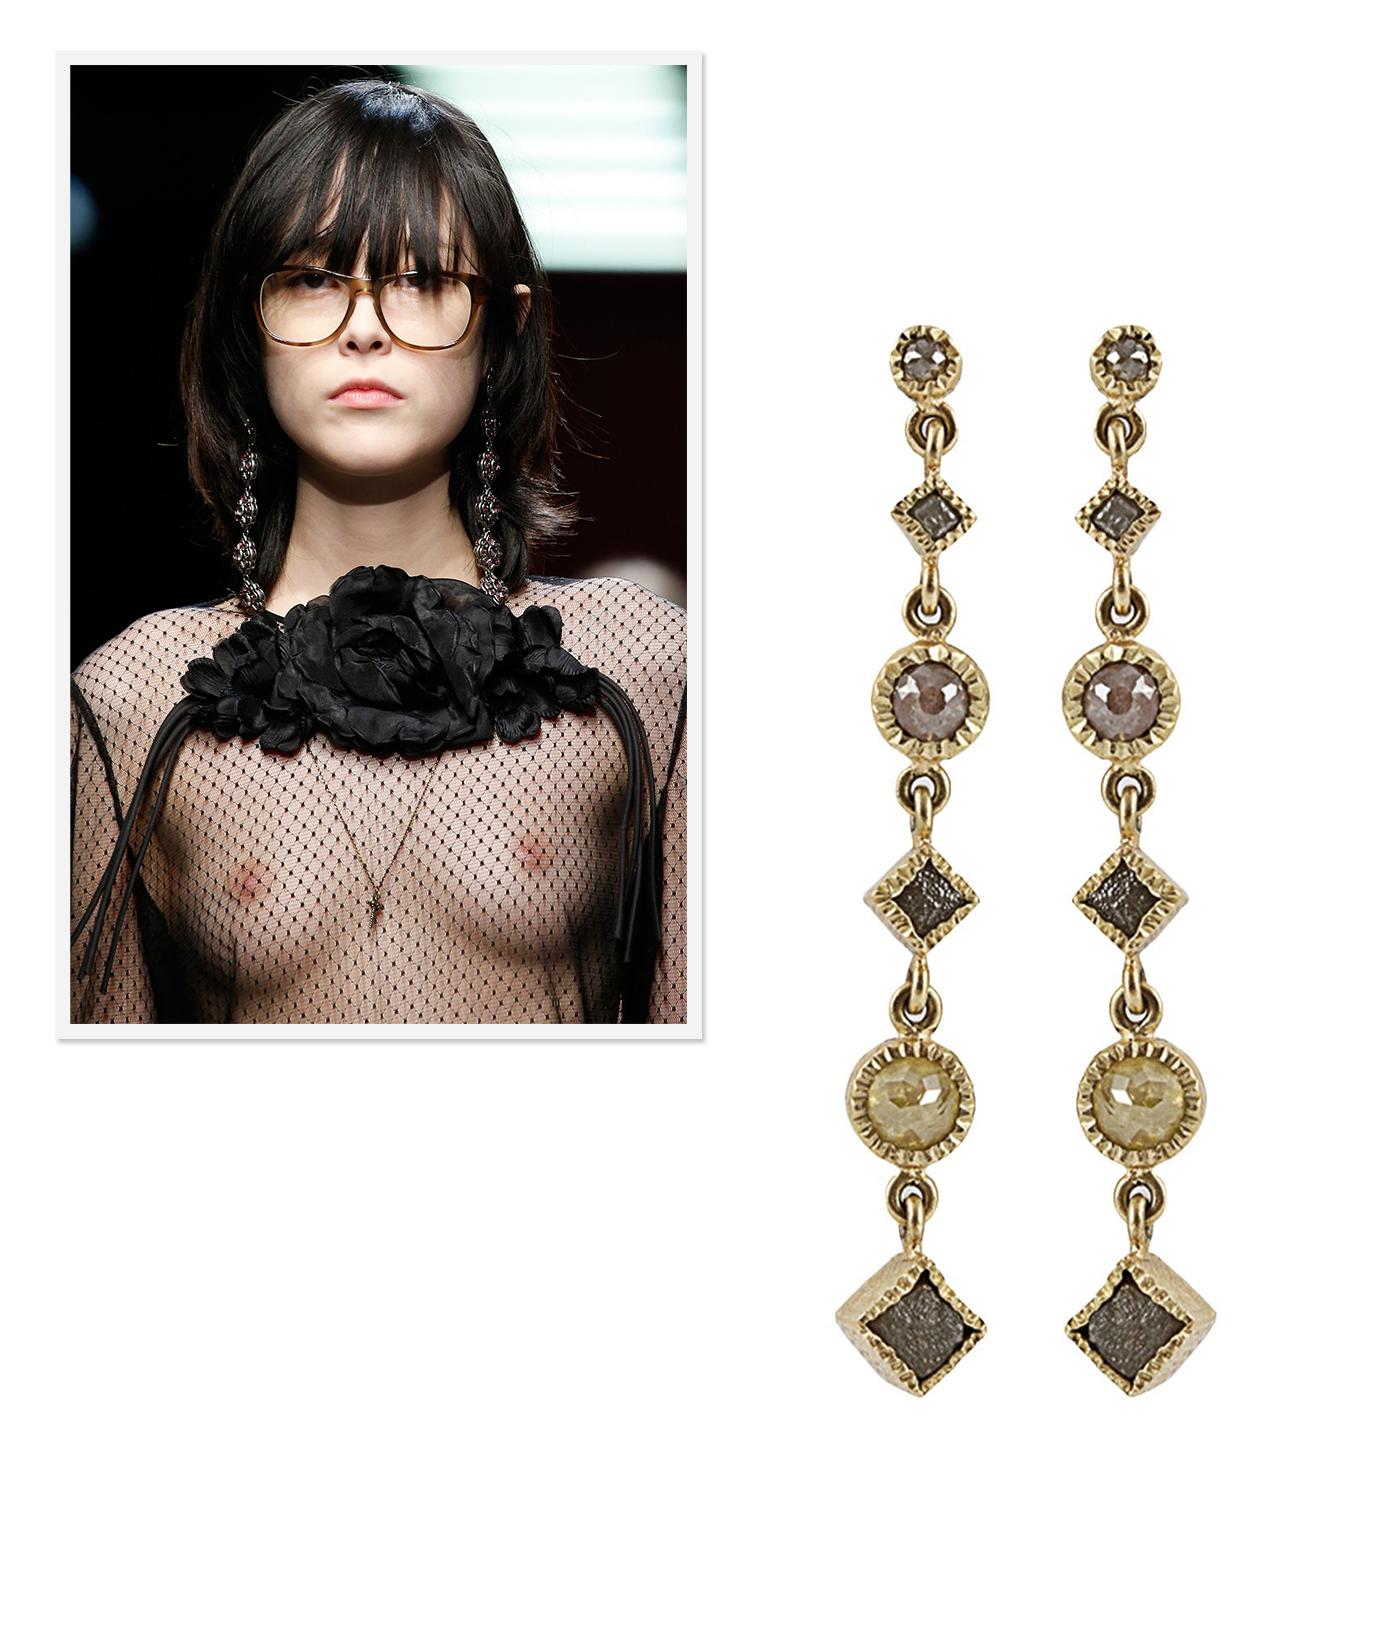 jewelry-trends-fall-2015-runway-09.jpg